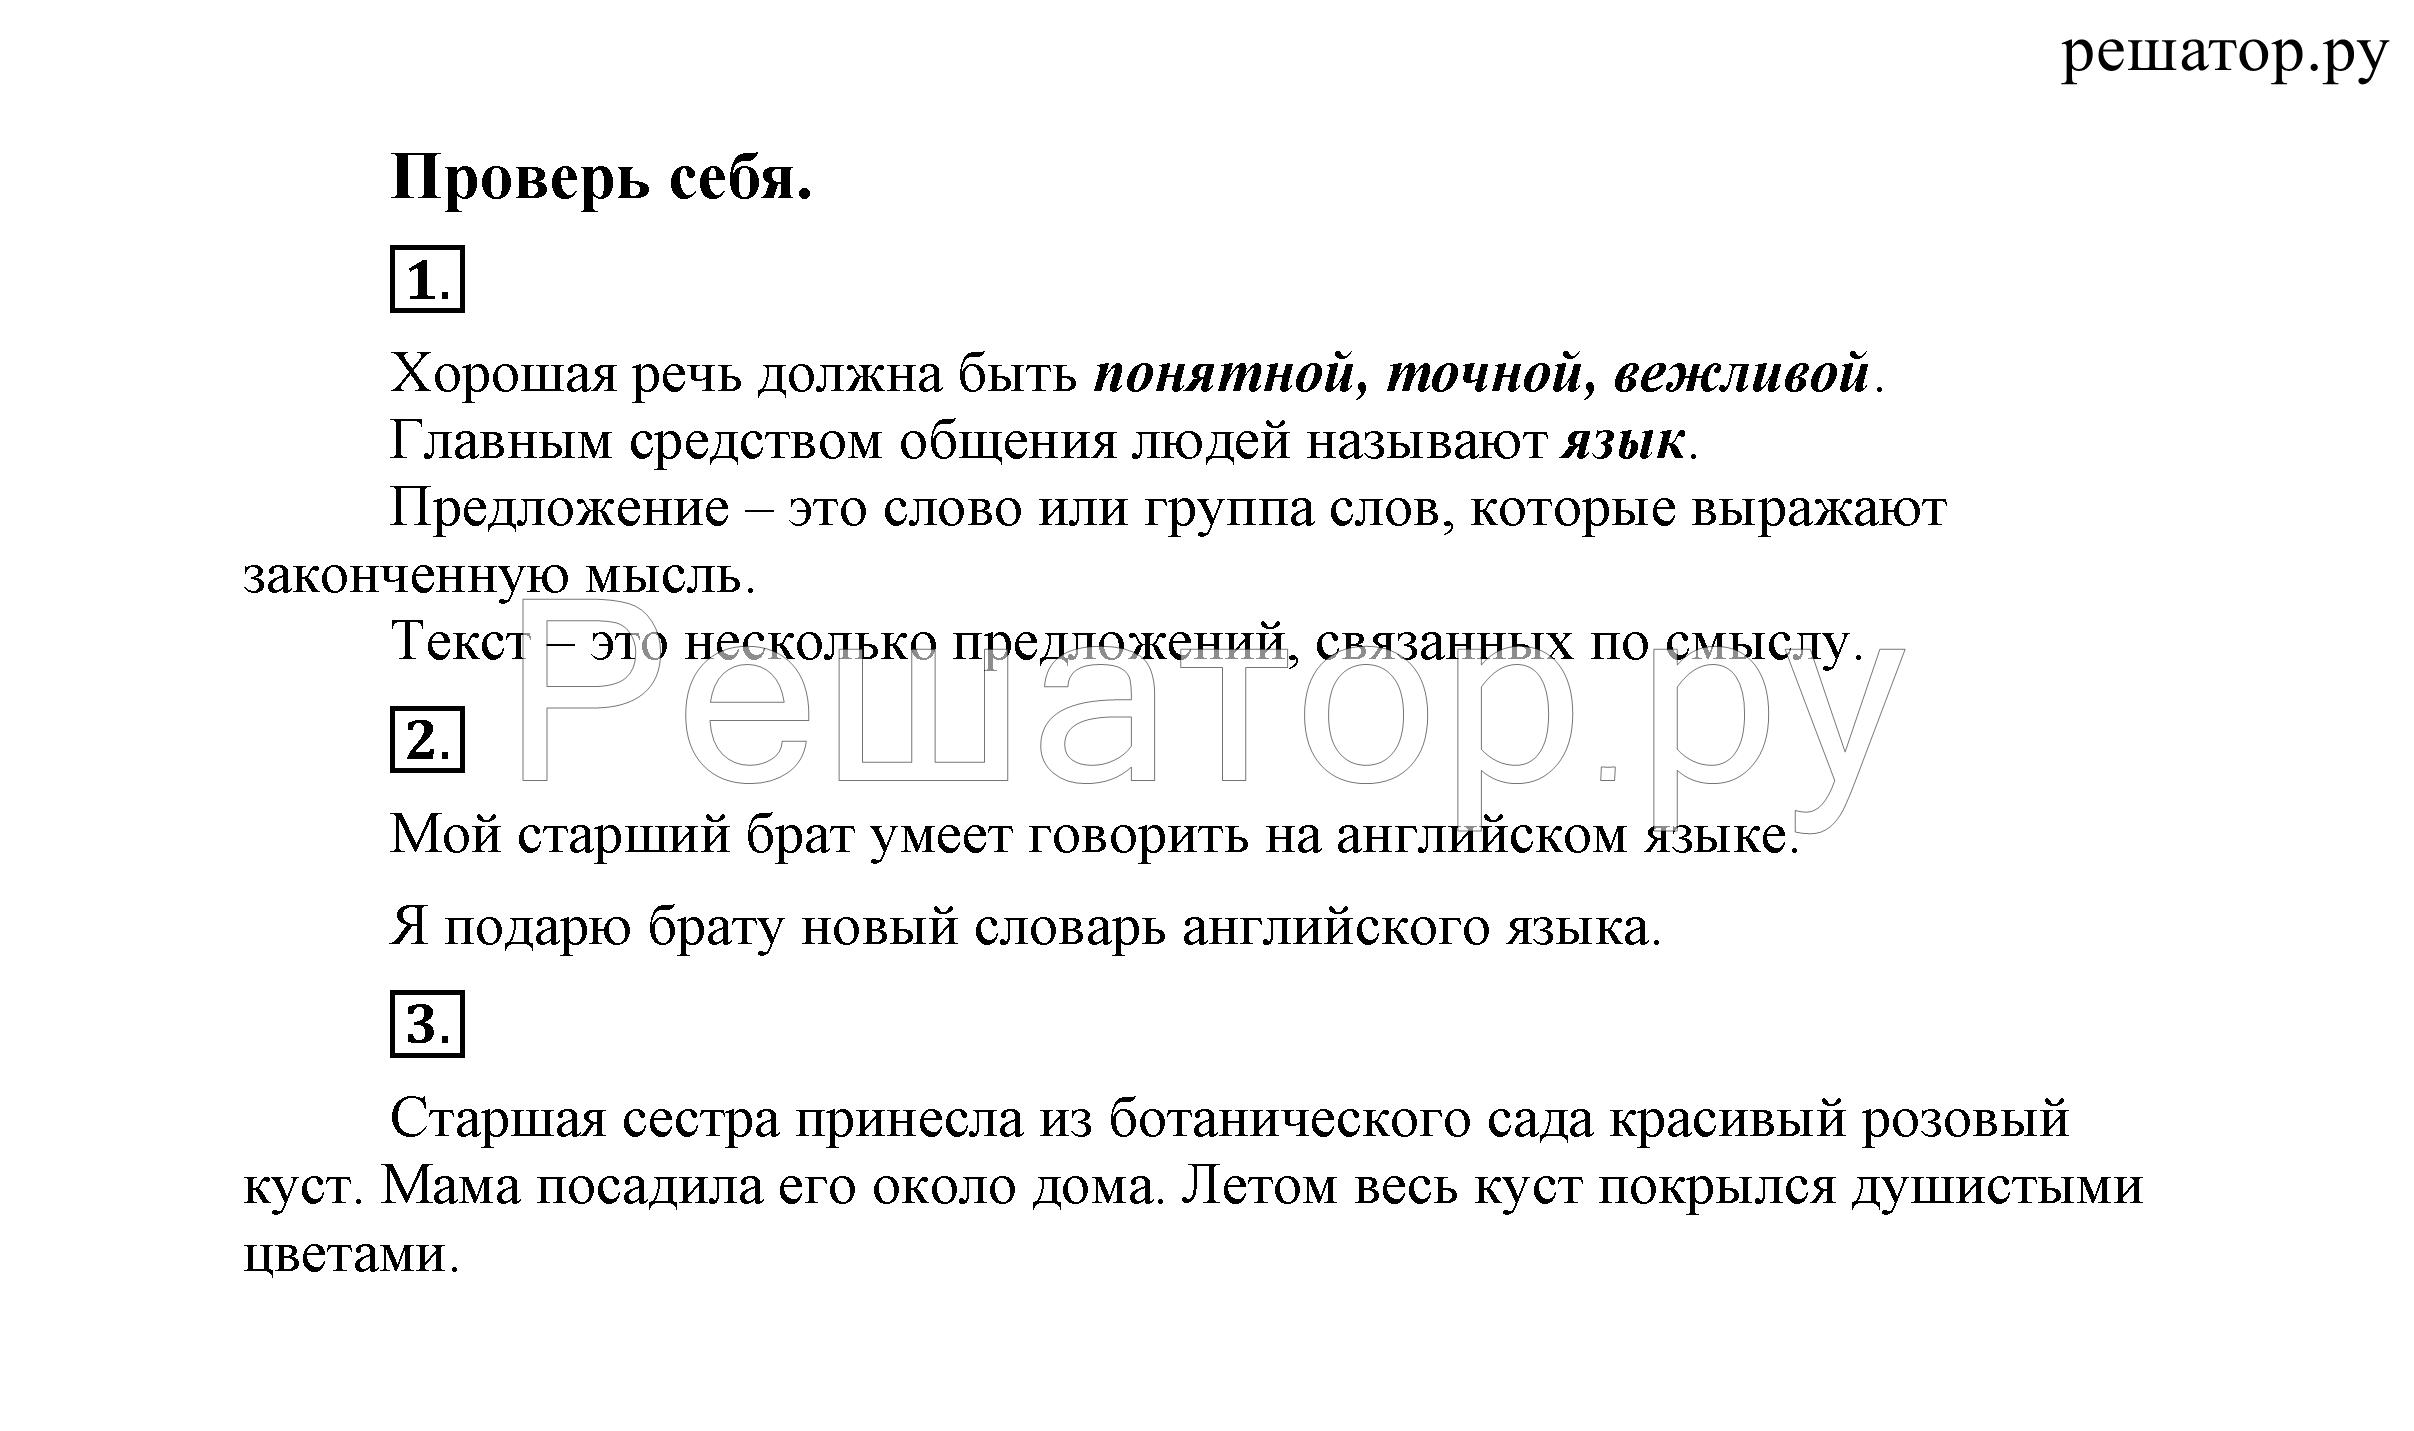 гдз русский язык 2 класс климанова бабушкина